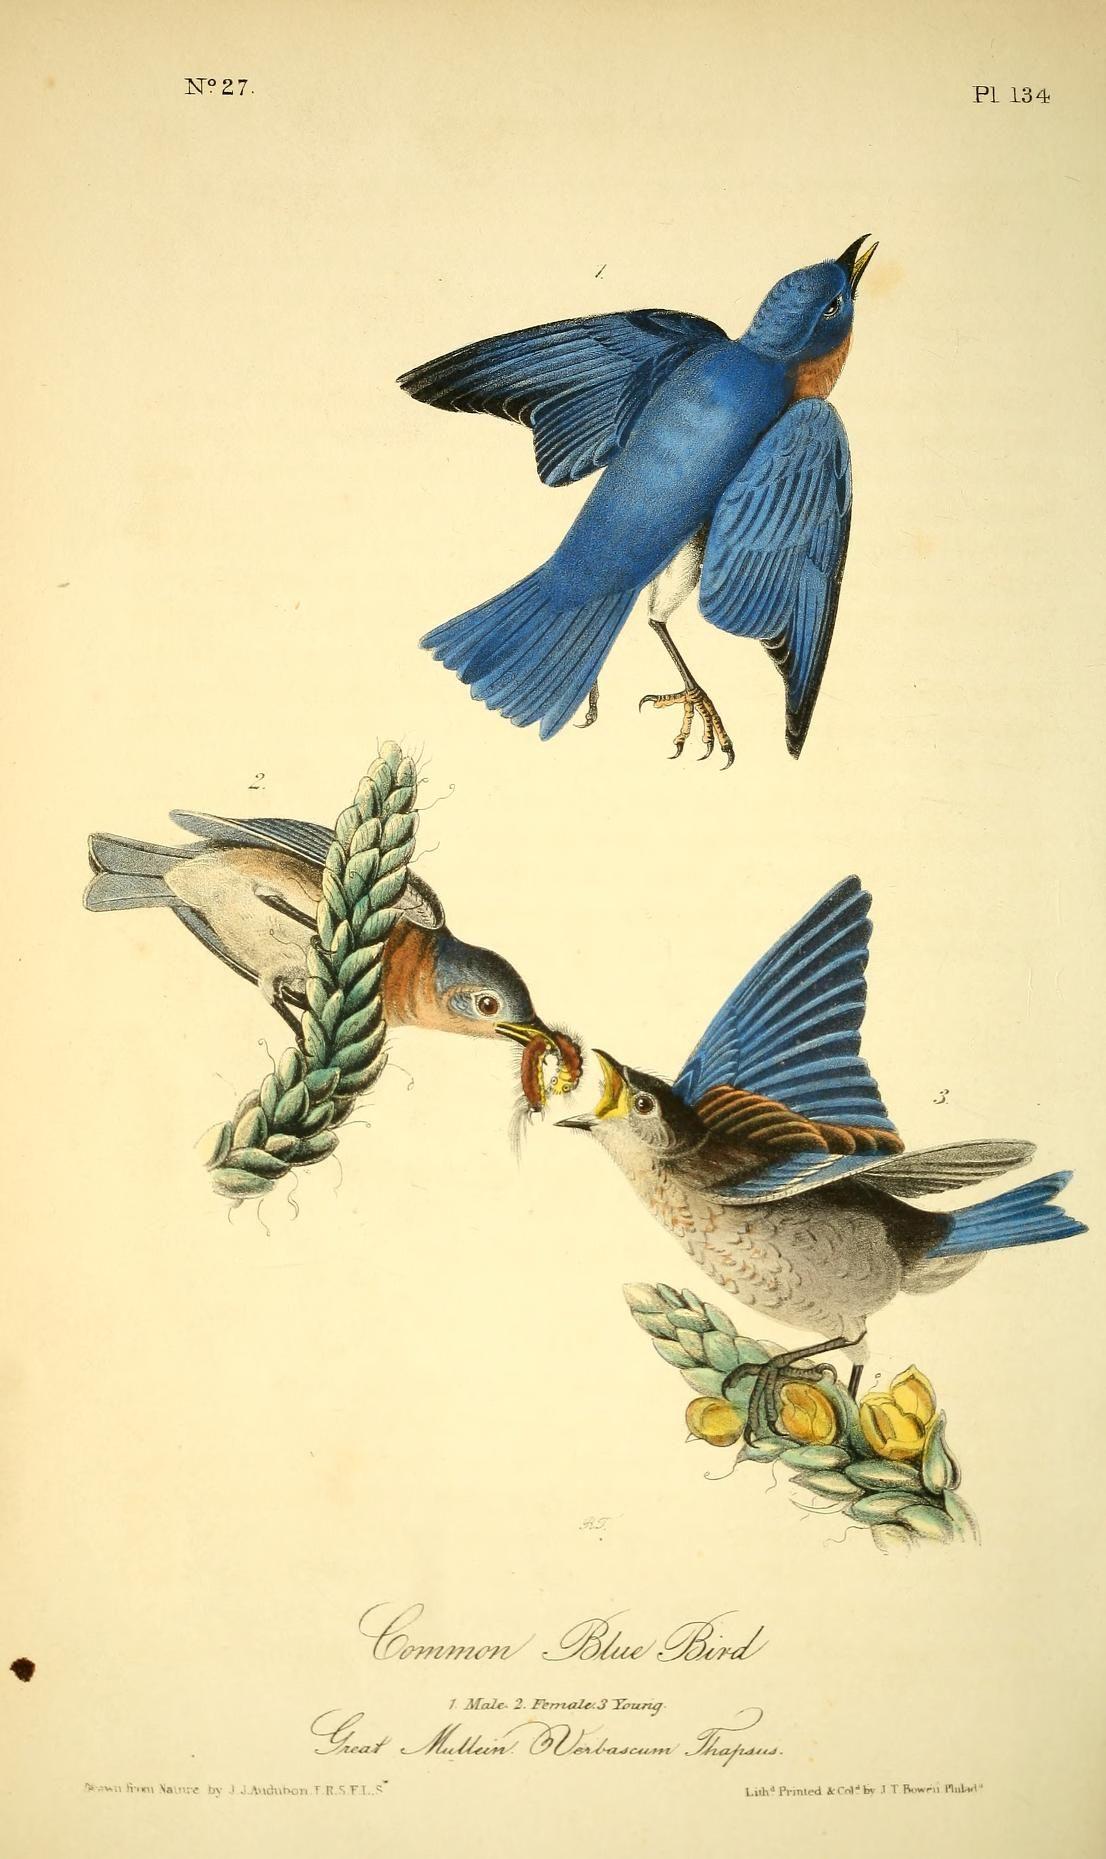 v 2 - The birds of America by John J Audubon : - Biodiversity Heritage Library  -  Common Bluebird